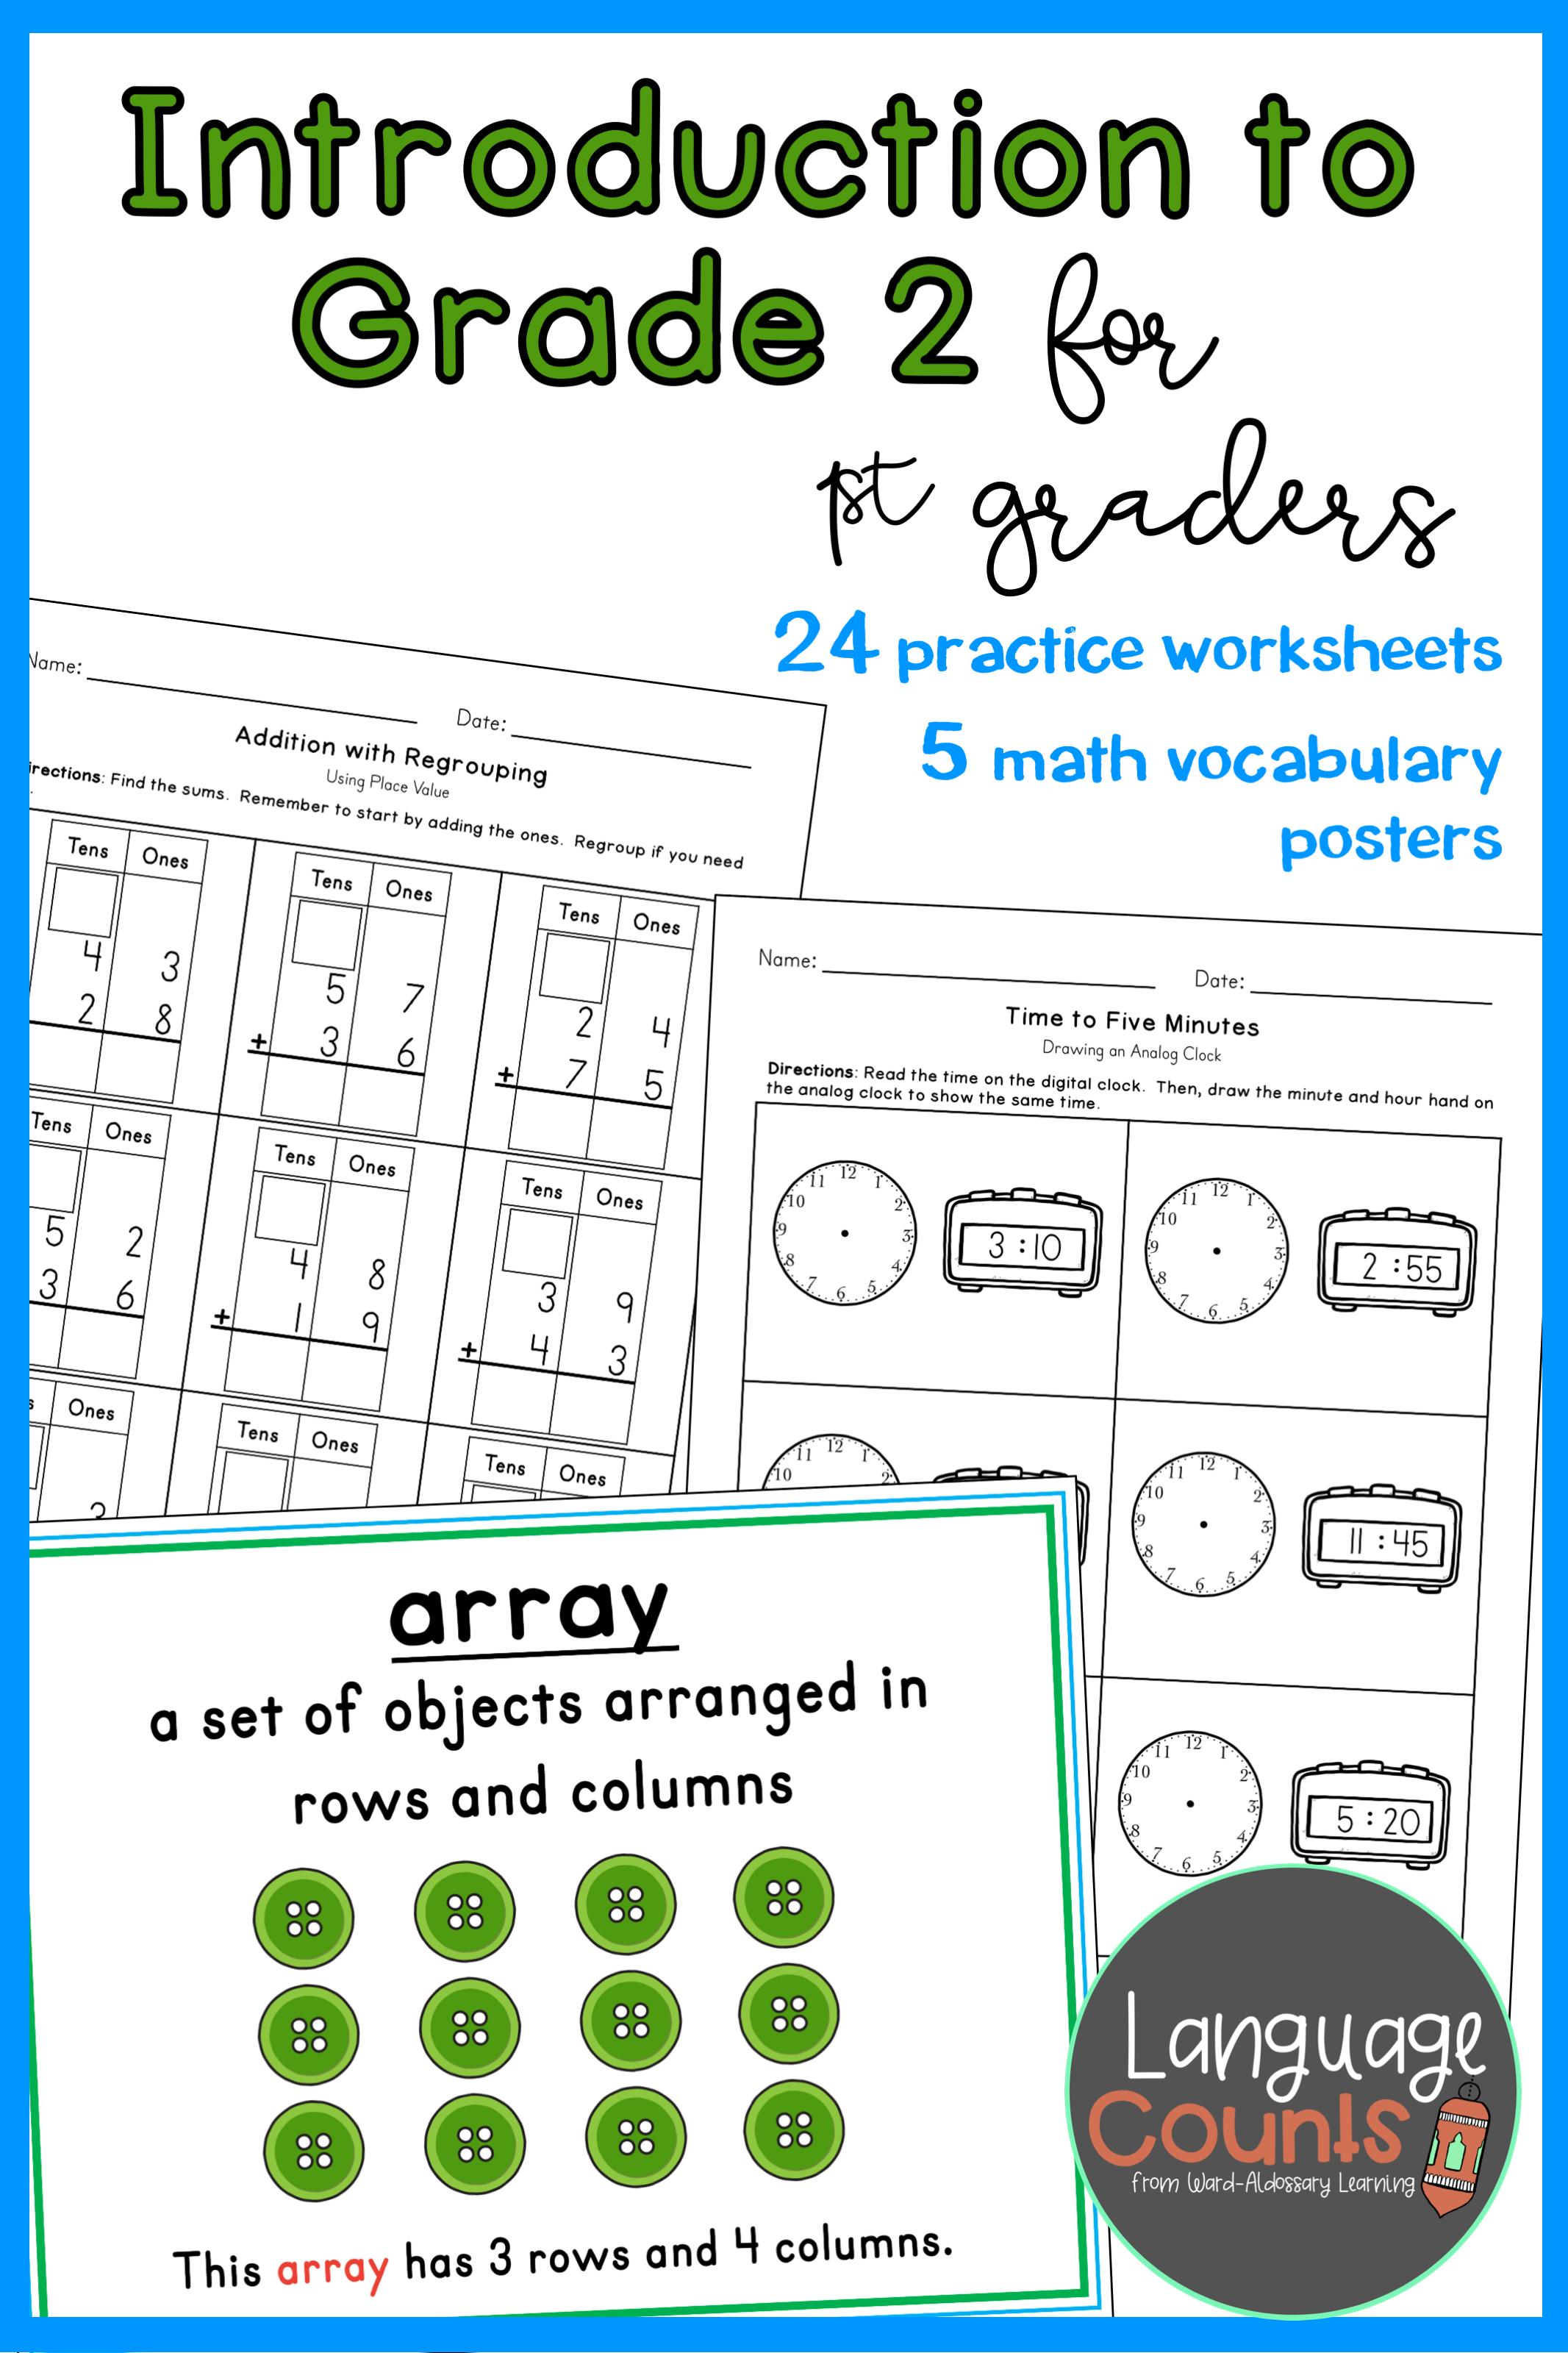 Introduction to Grade 2 Topics- 1st Grade   Elementary school math [ 3200 x 2133 Pixel ]